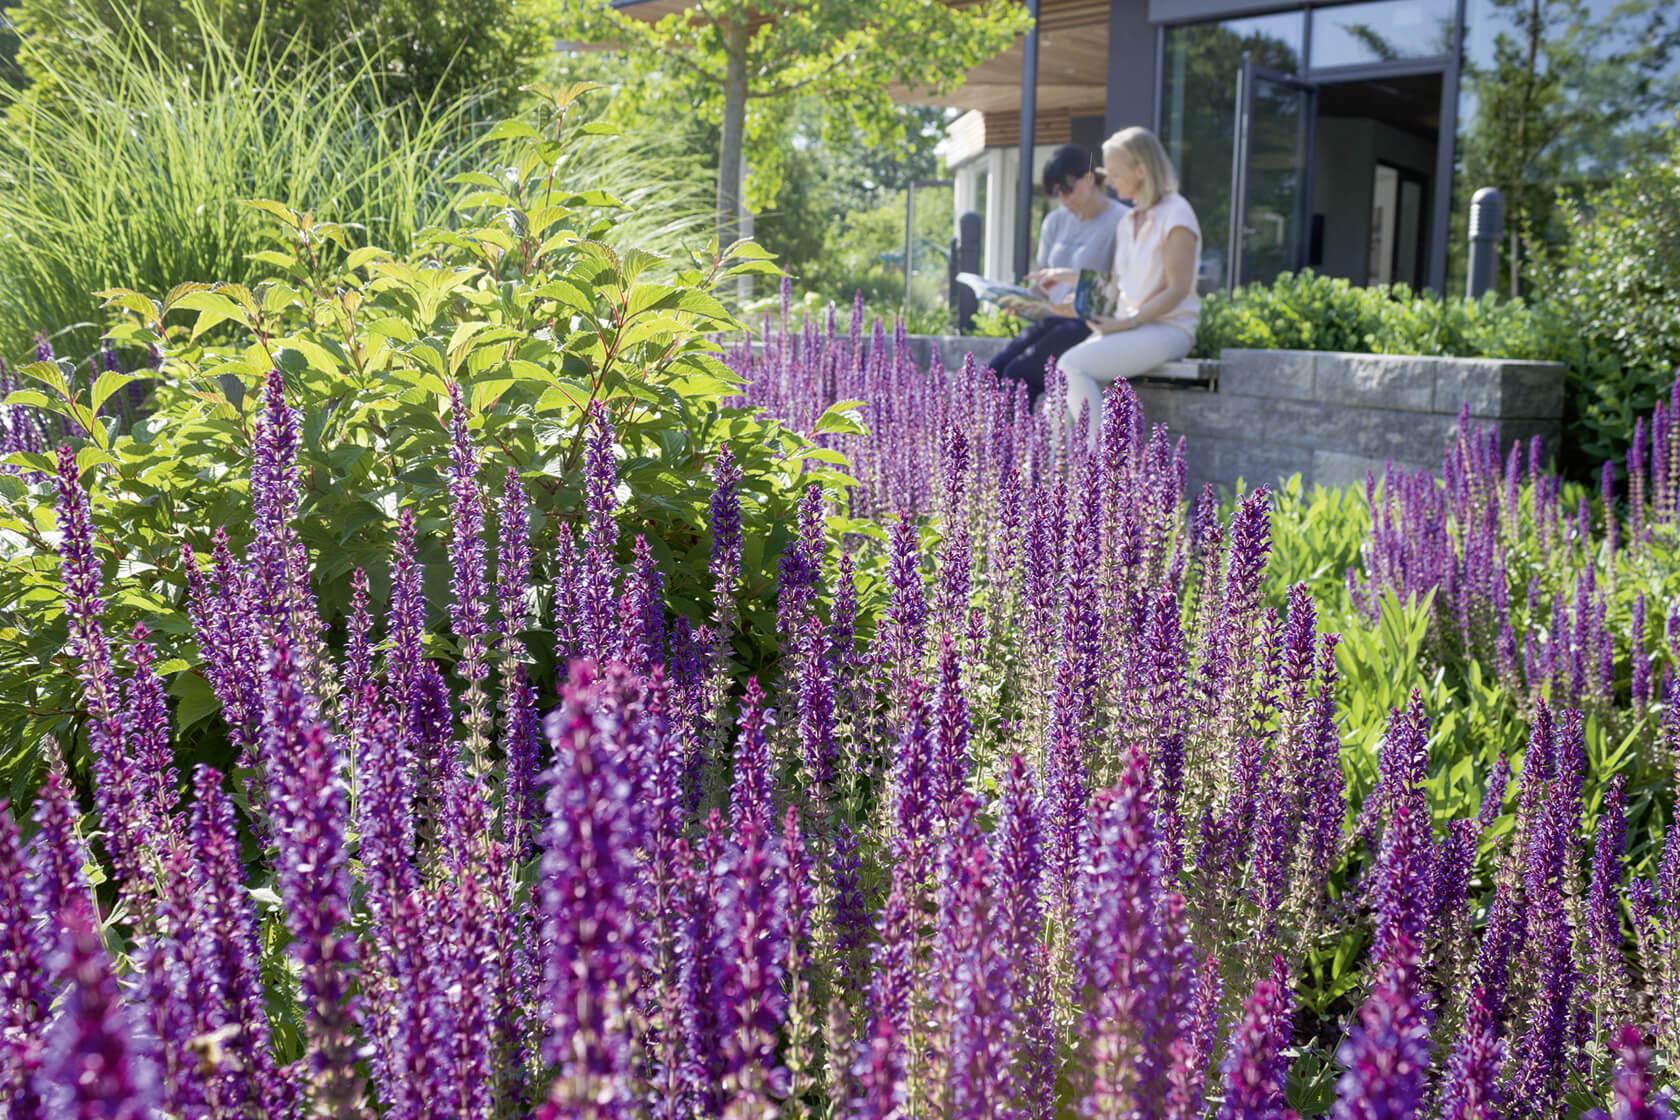 Ein lila Blumenbeet als Gestaltungselement im Ideengarten.